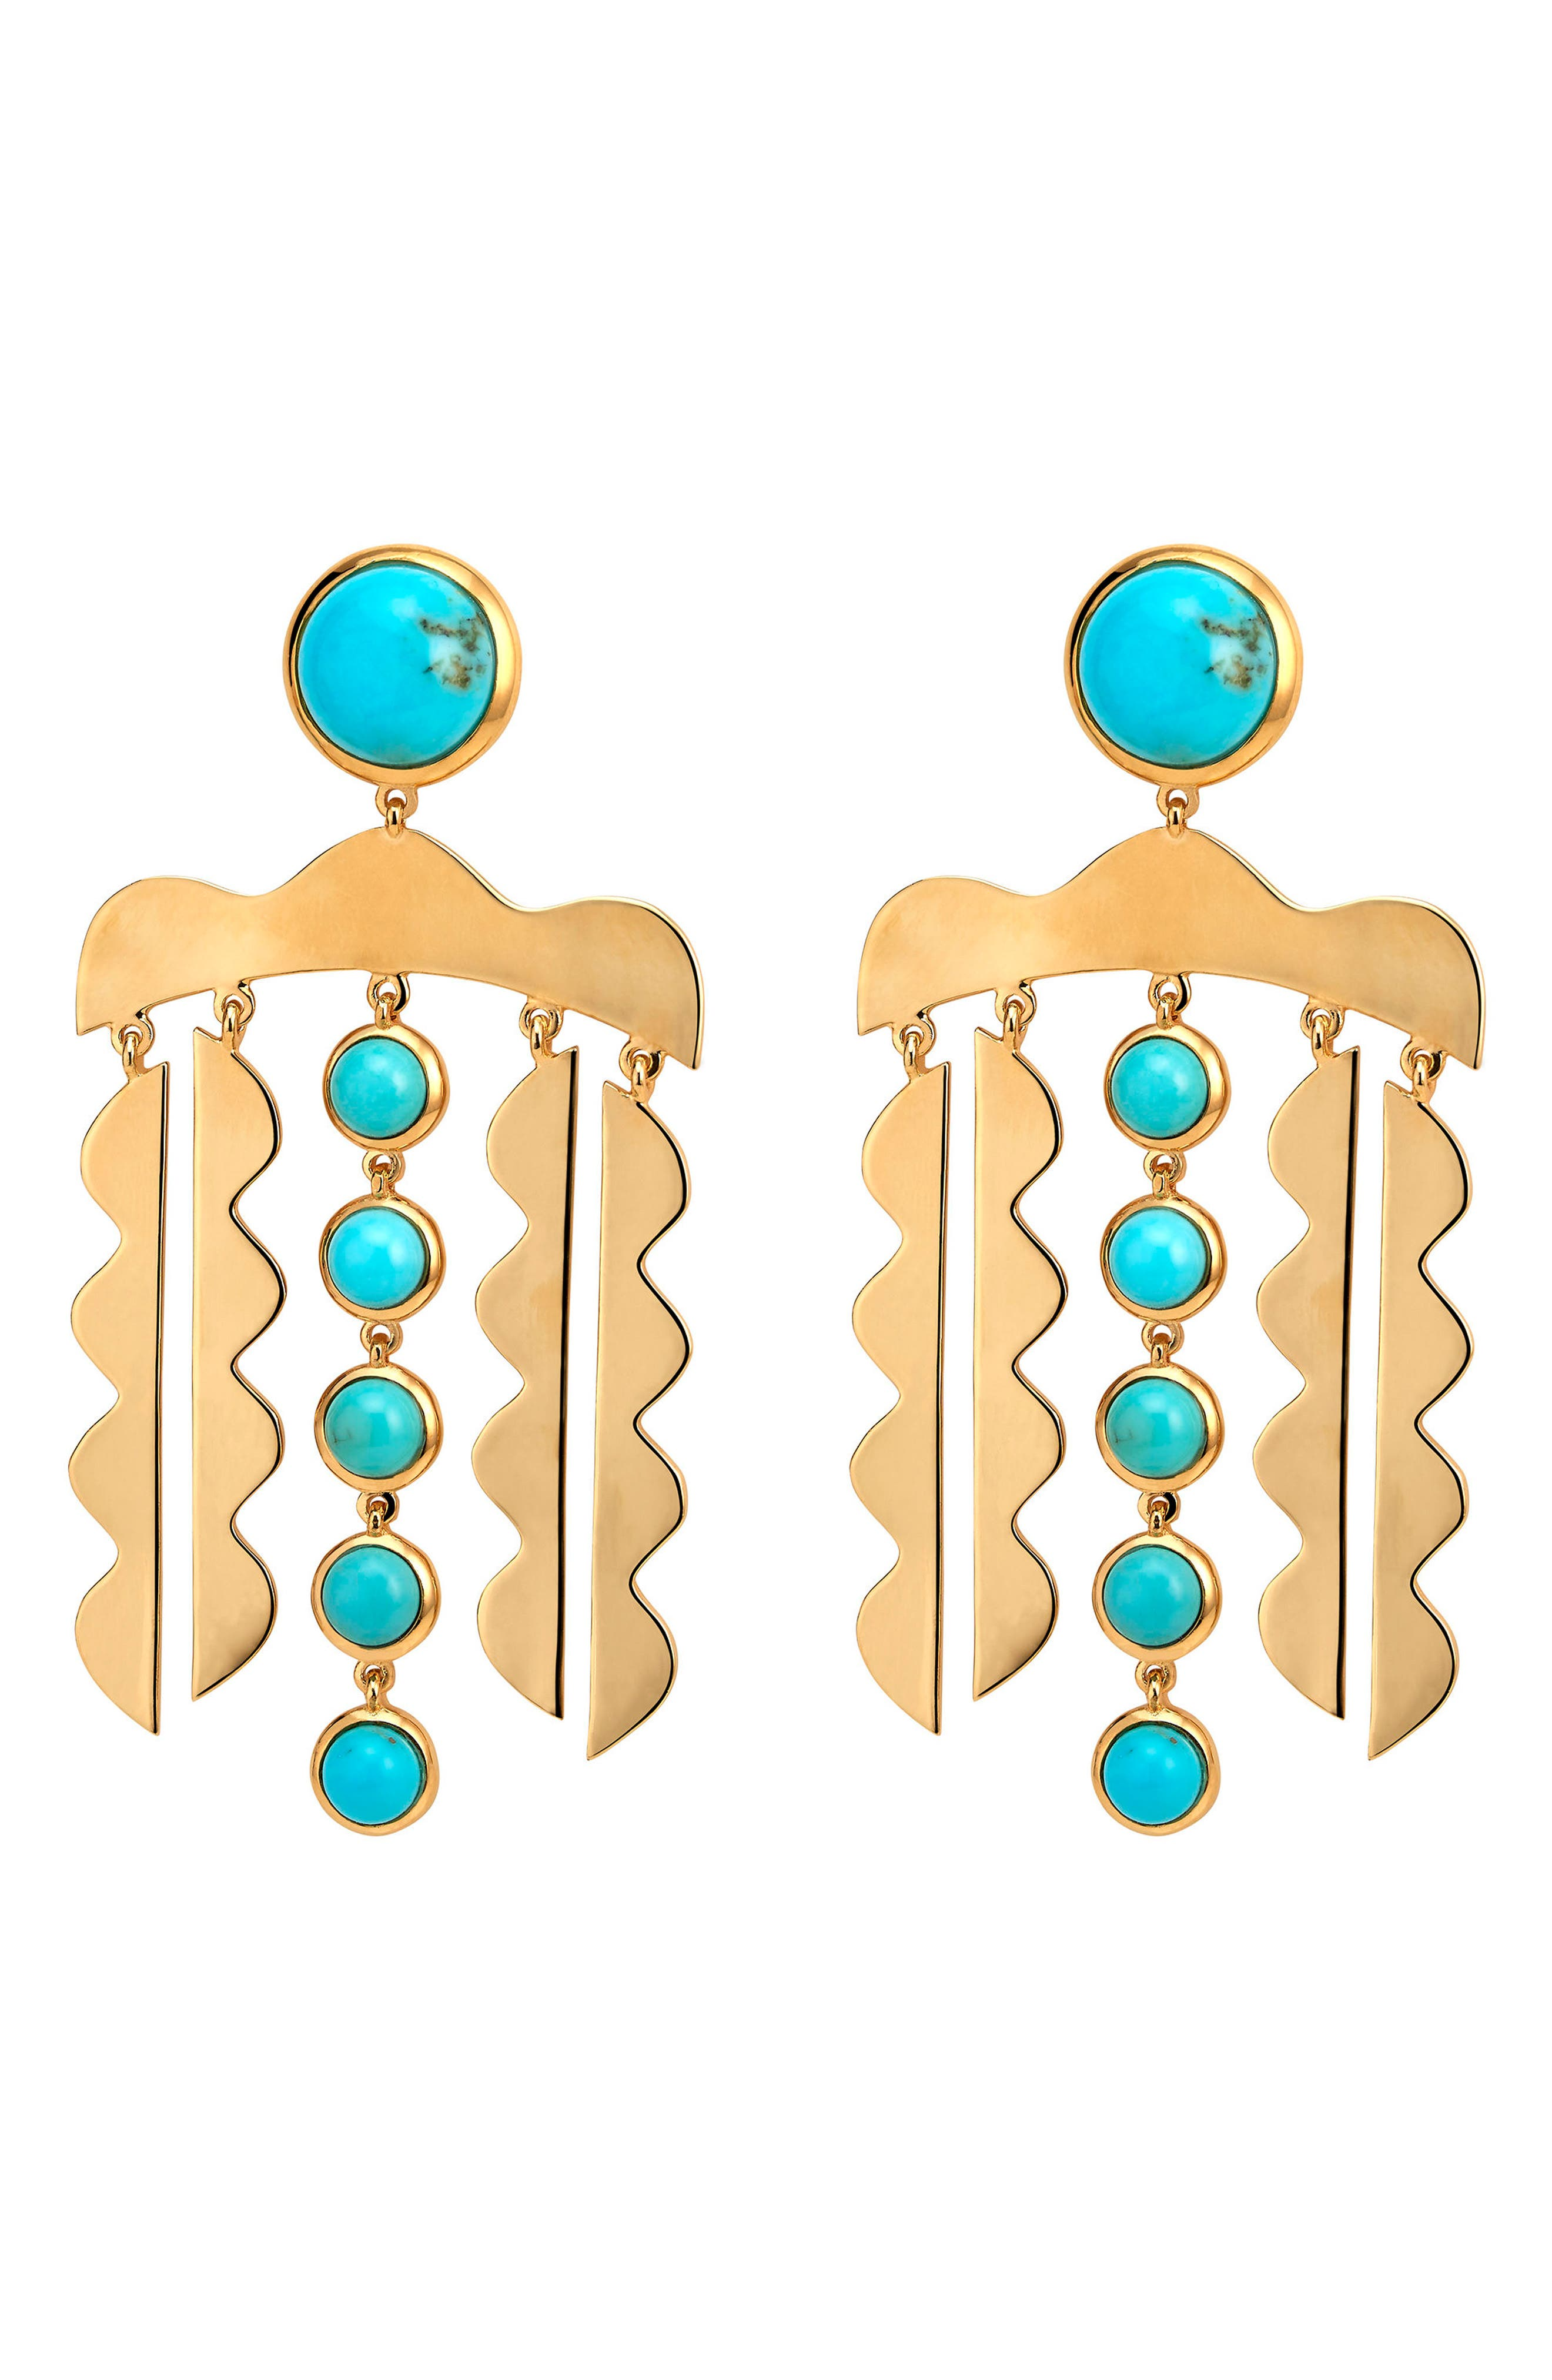 Mustique Chandelier Drop Earrings,                             Main thumbnail 1, color,                             TURQUOISE/ GOLD